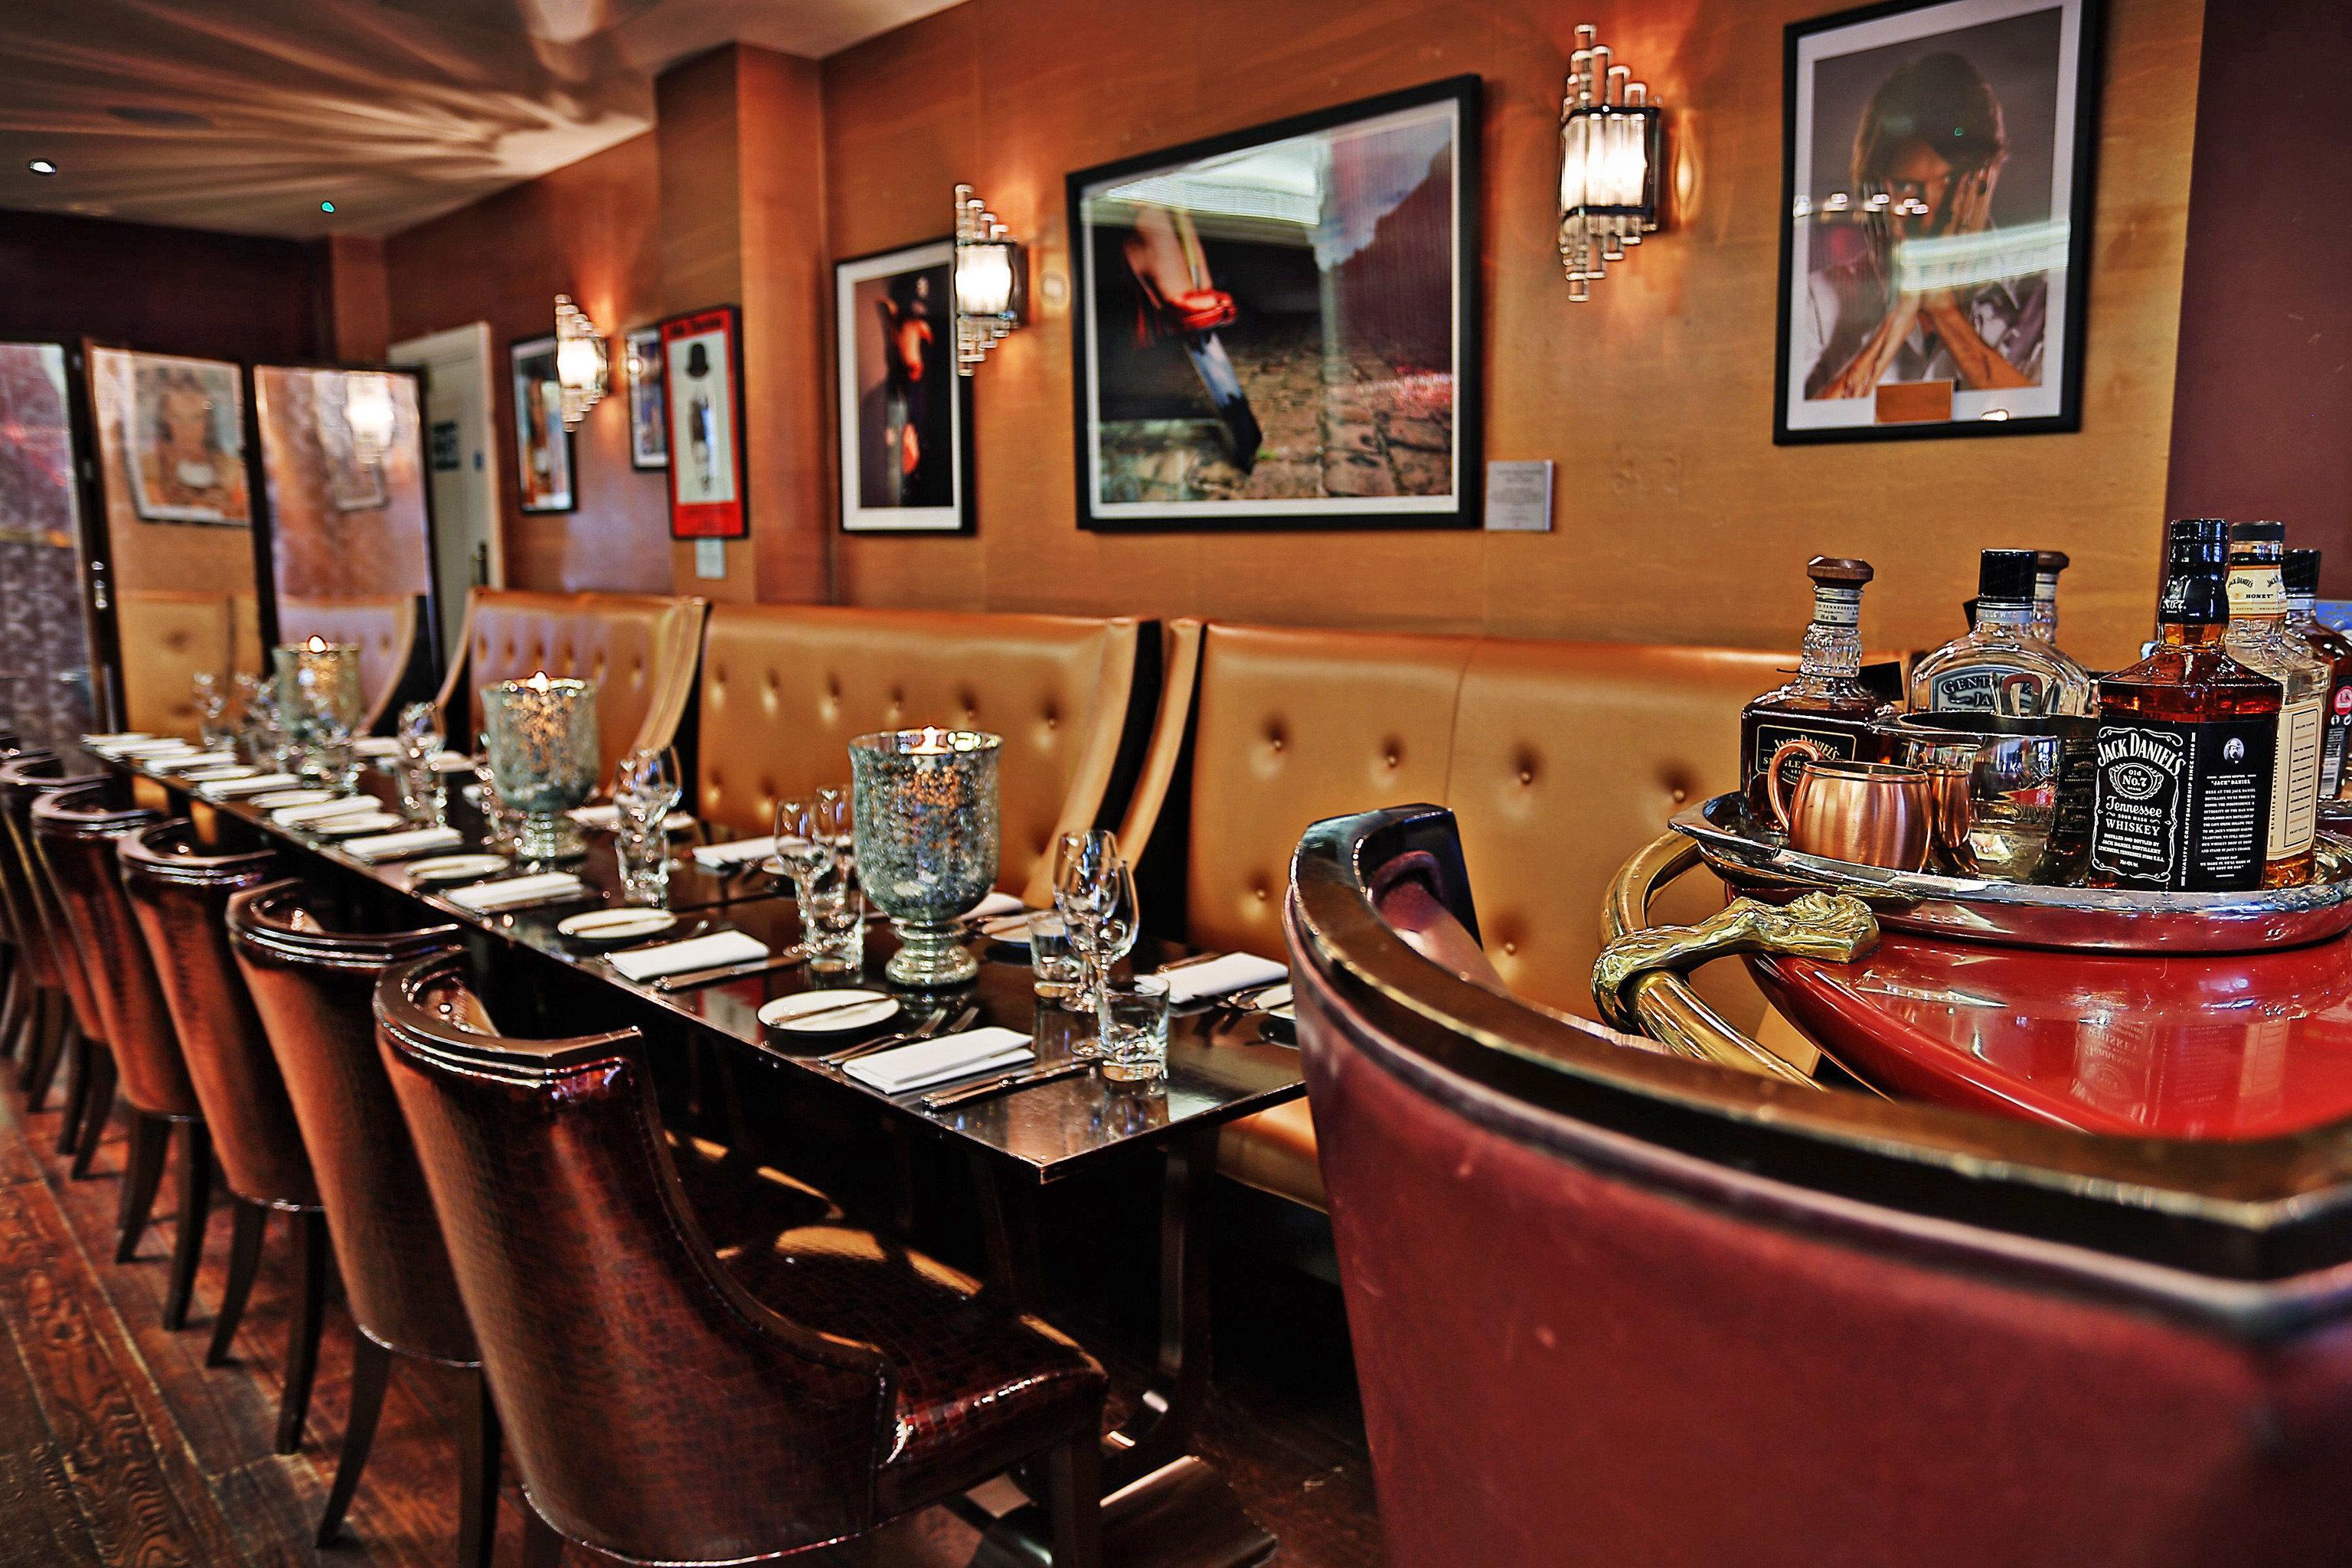 Bar Dining Drink Eat Hip Modern restaurant dining table